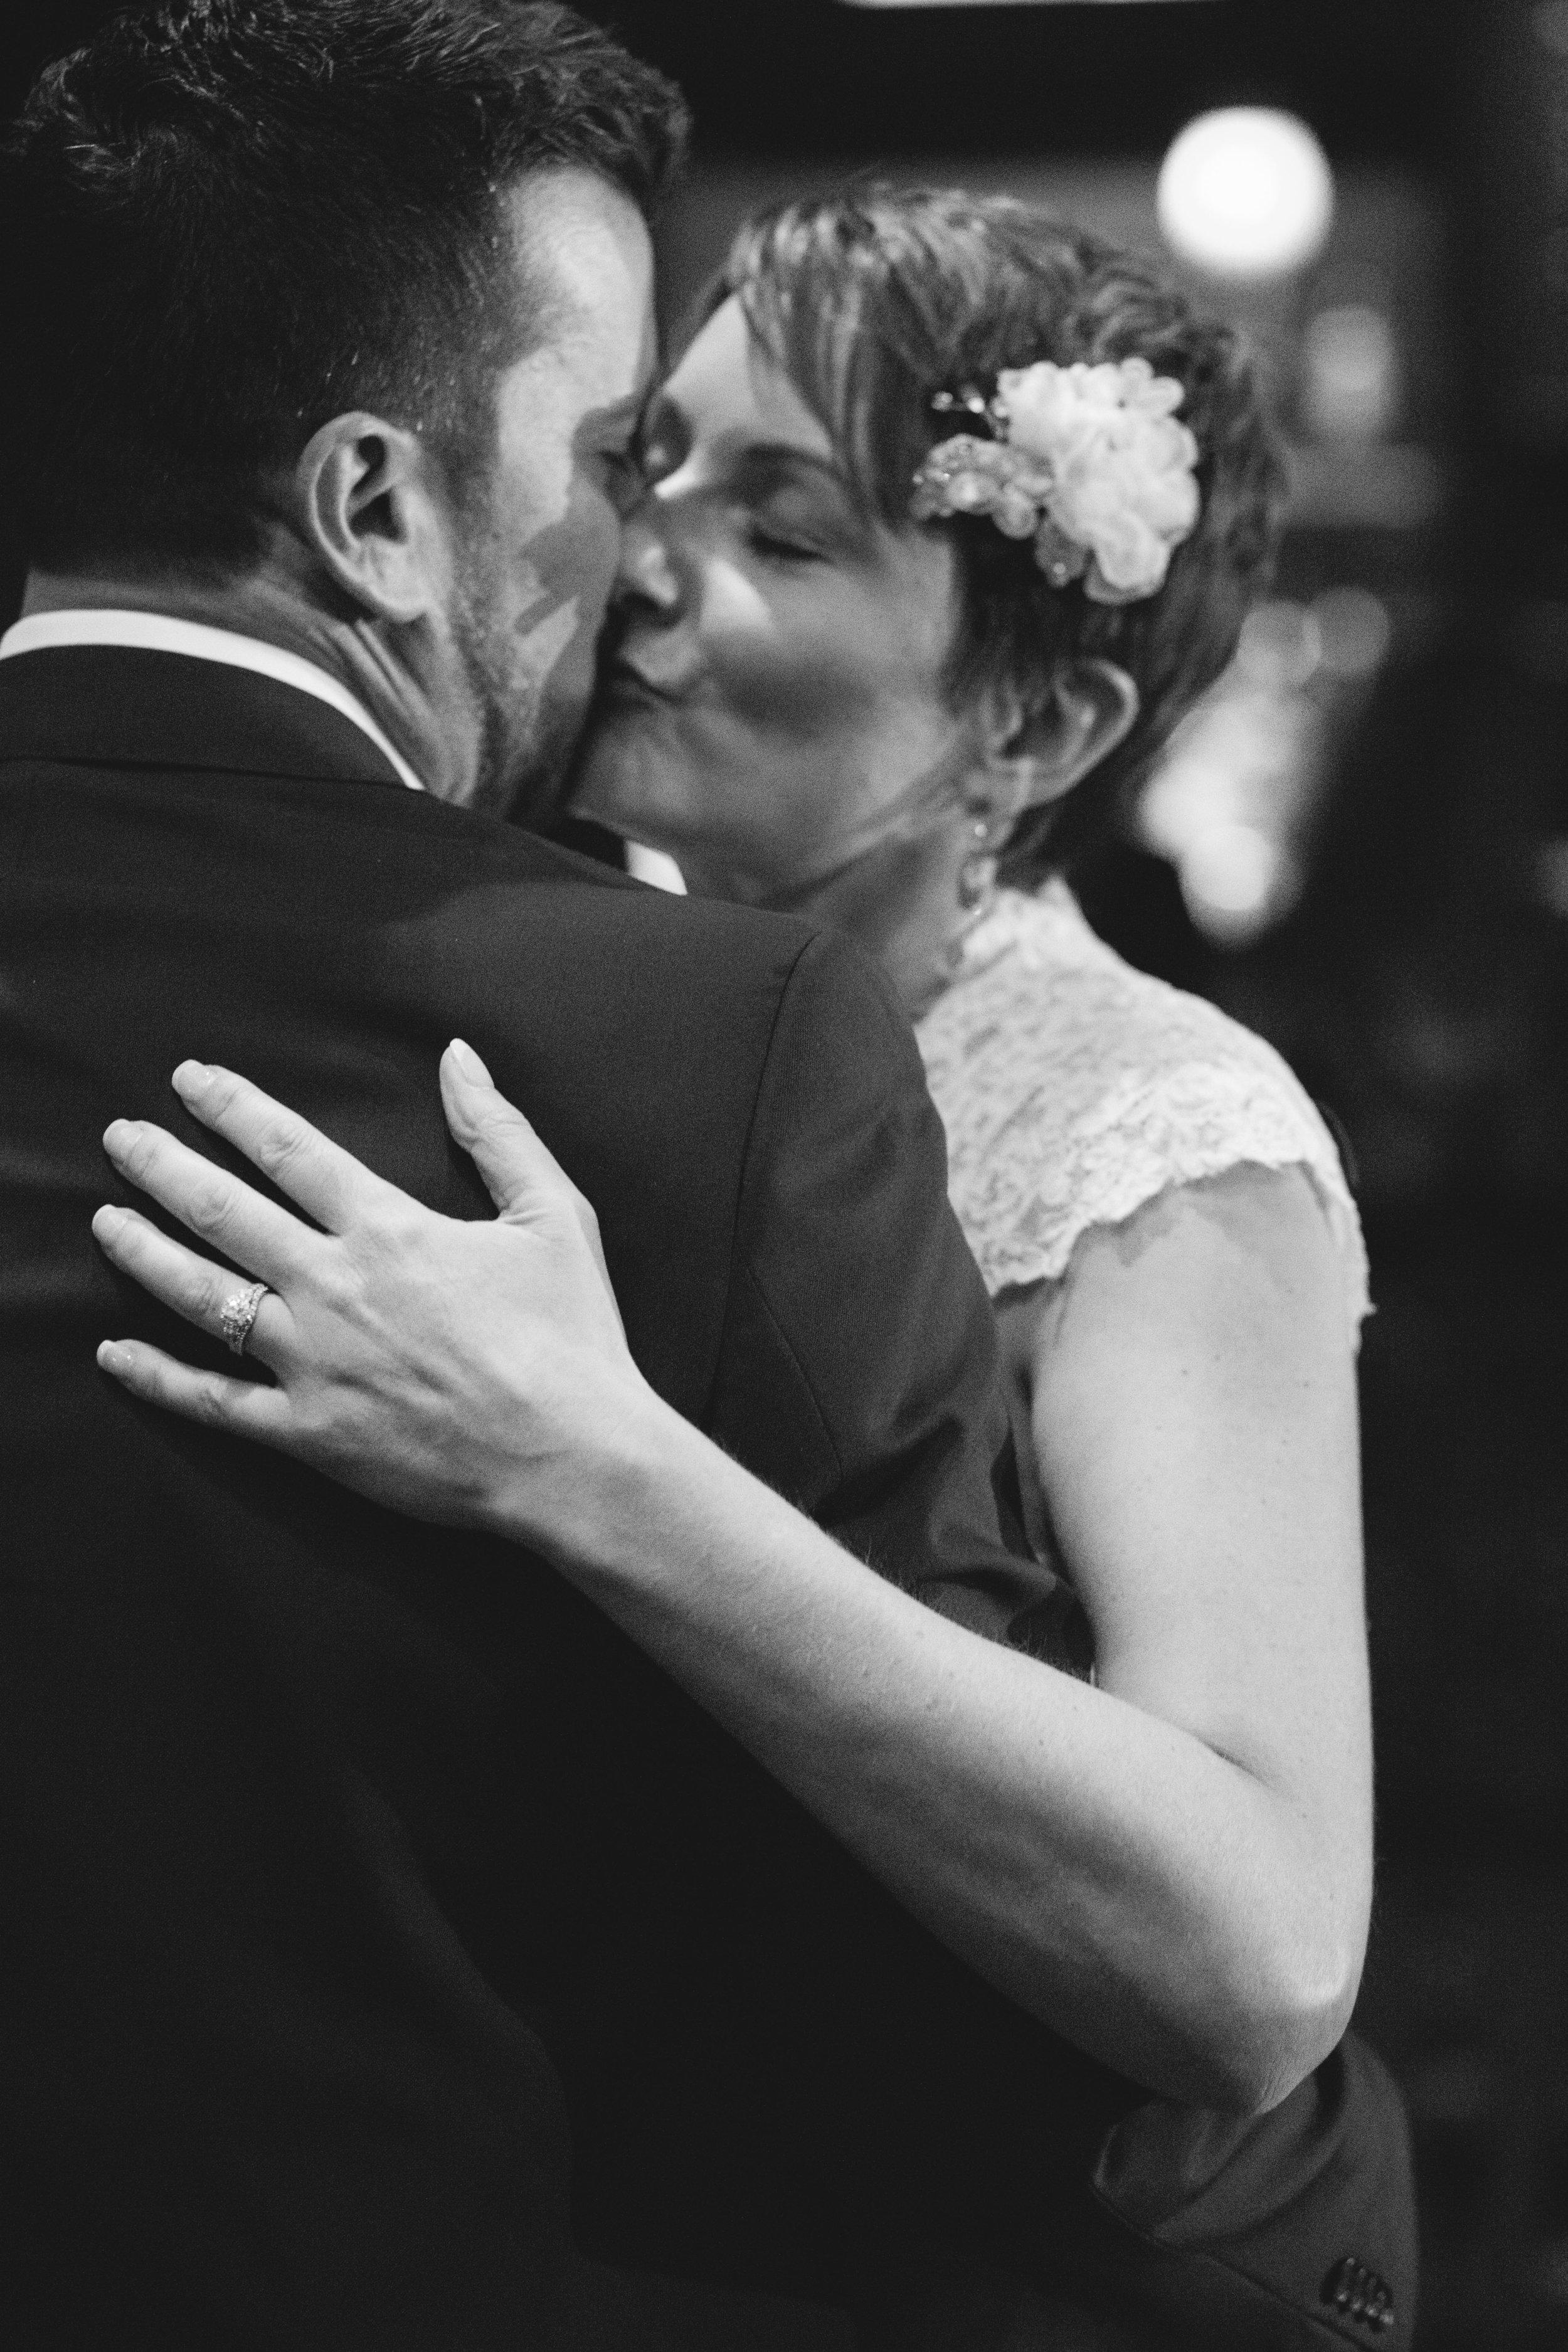 ATGI_Kat and Gabe Wedding 2016_2S8A5968.jpg